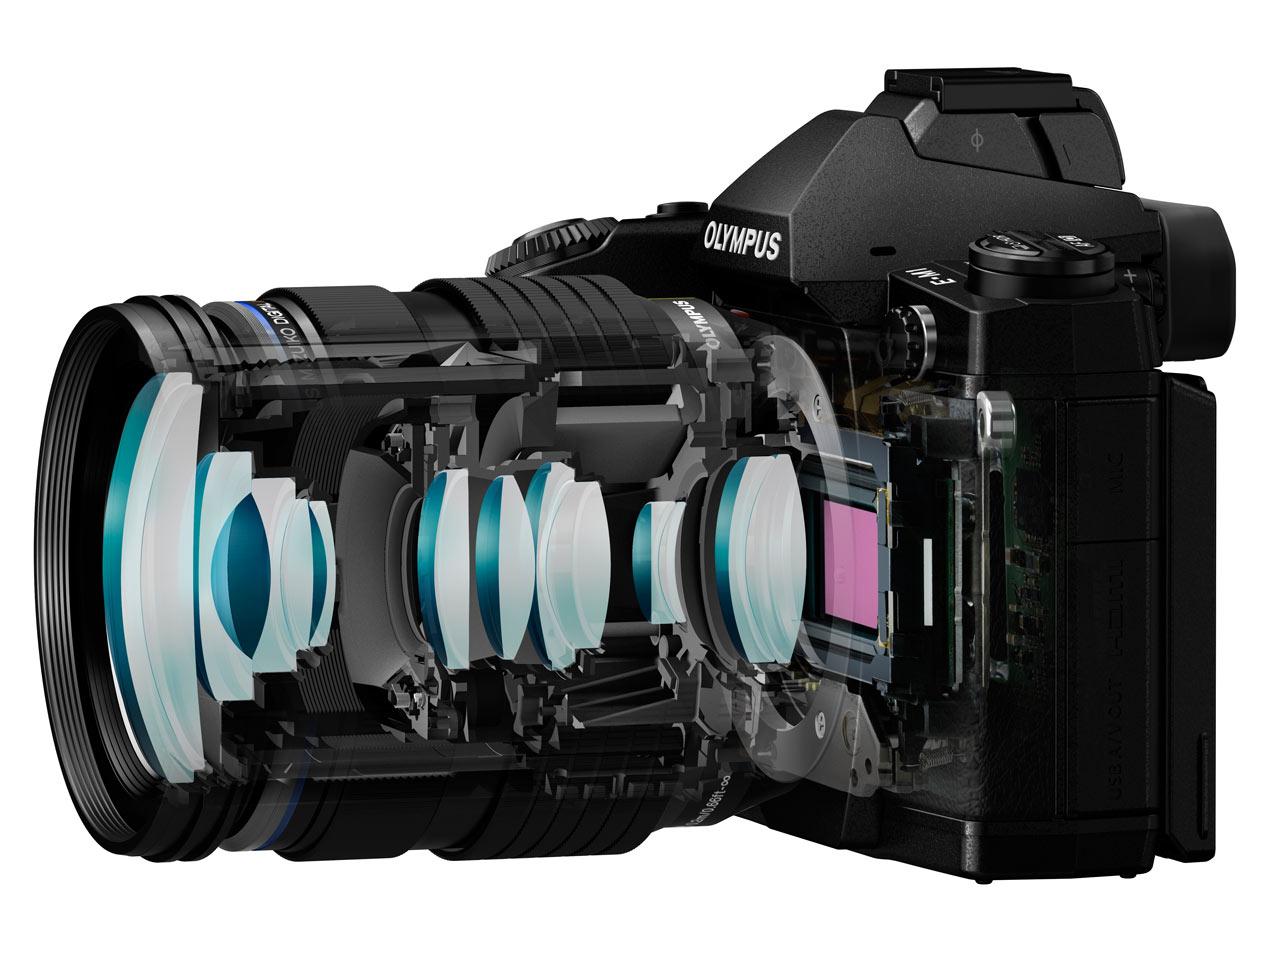 Olympus Introduces Mzuiko Digital Ed 12 40mm F28 Pro Zoom Om D E M5 Mark Ii Kit F 28 Cutaway Showing Optical Design